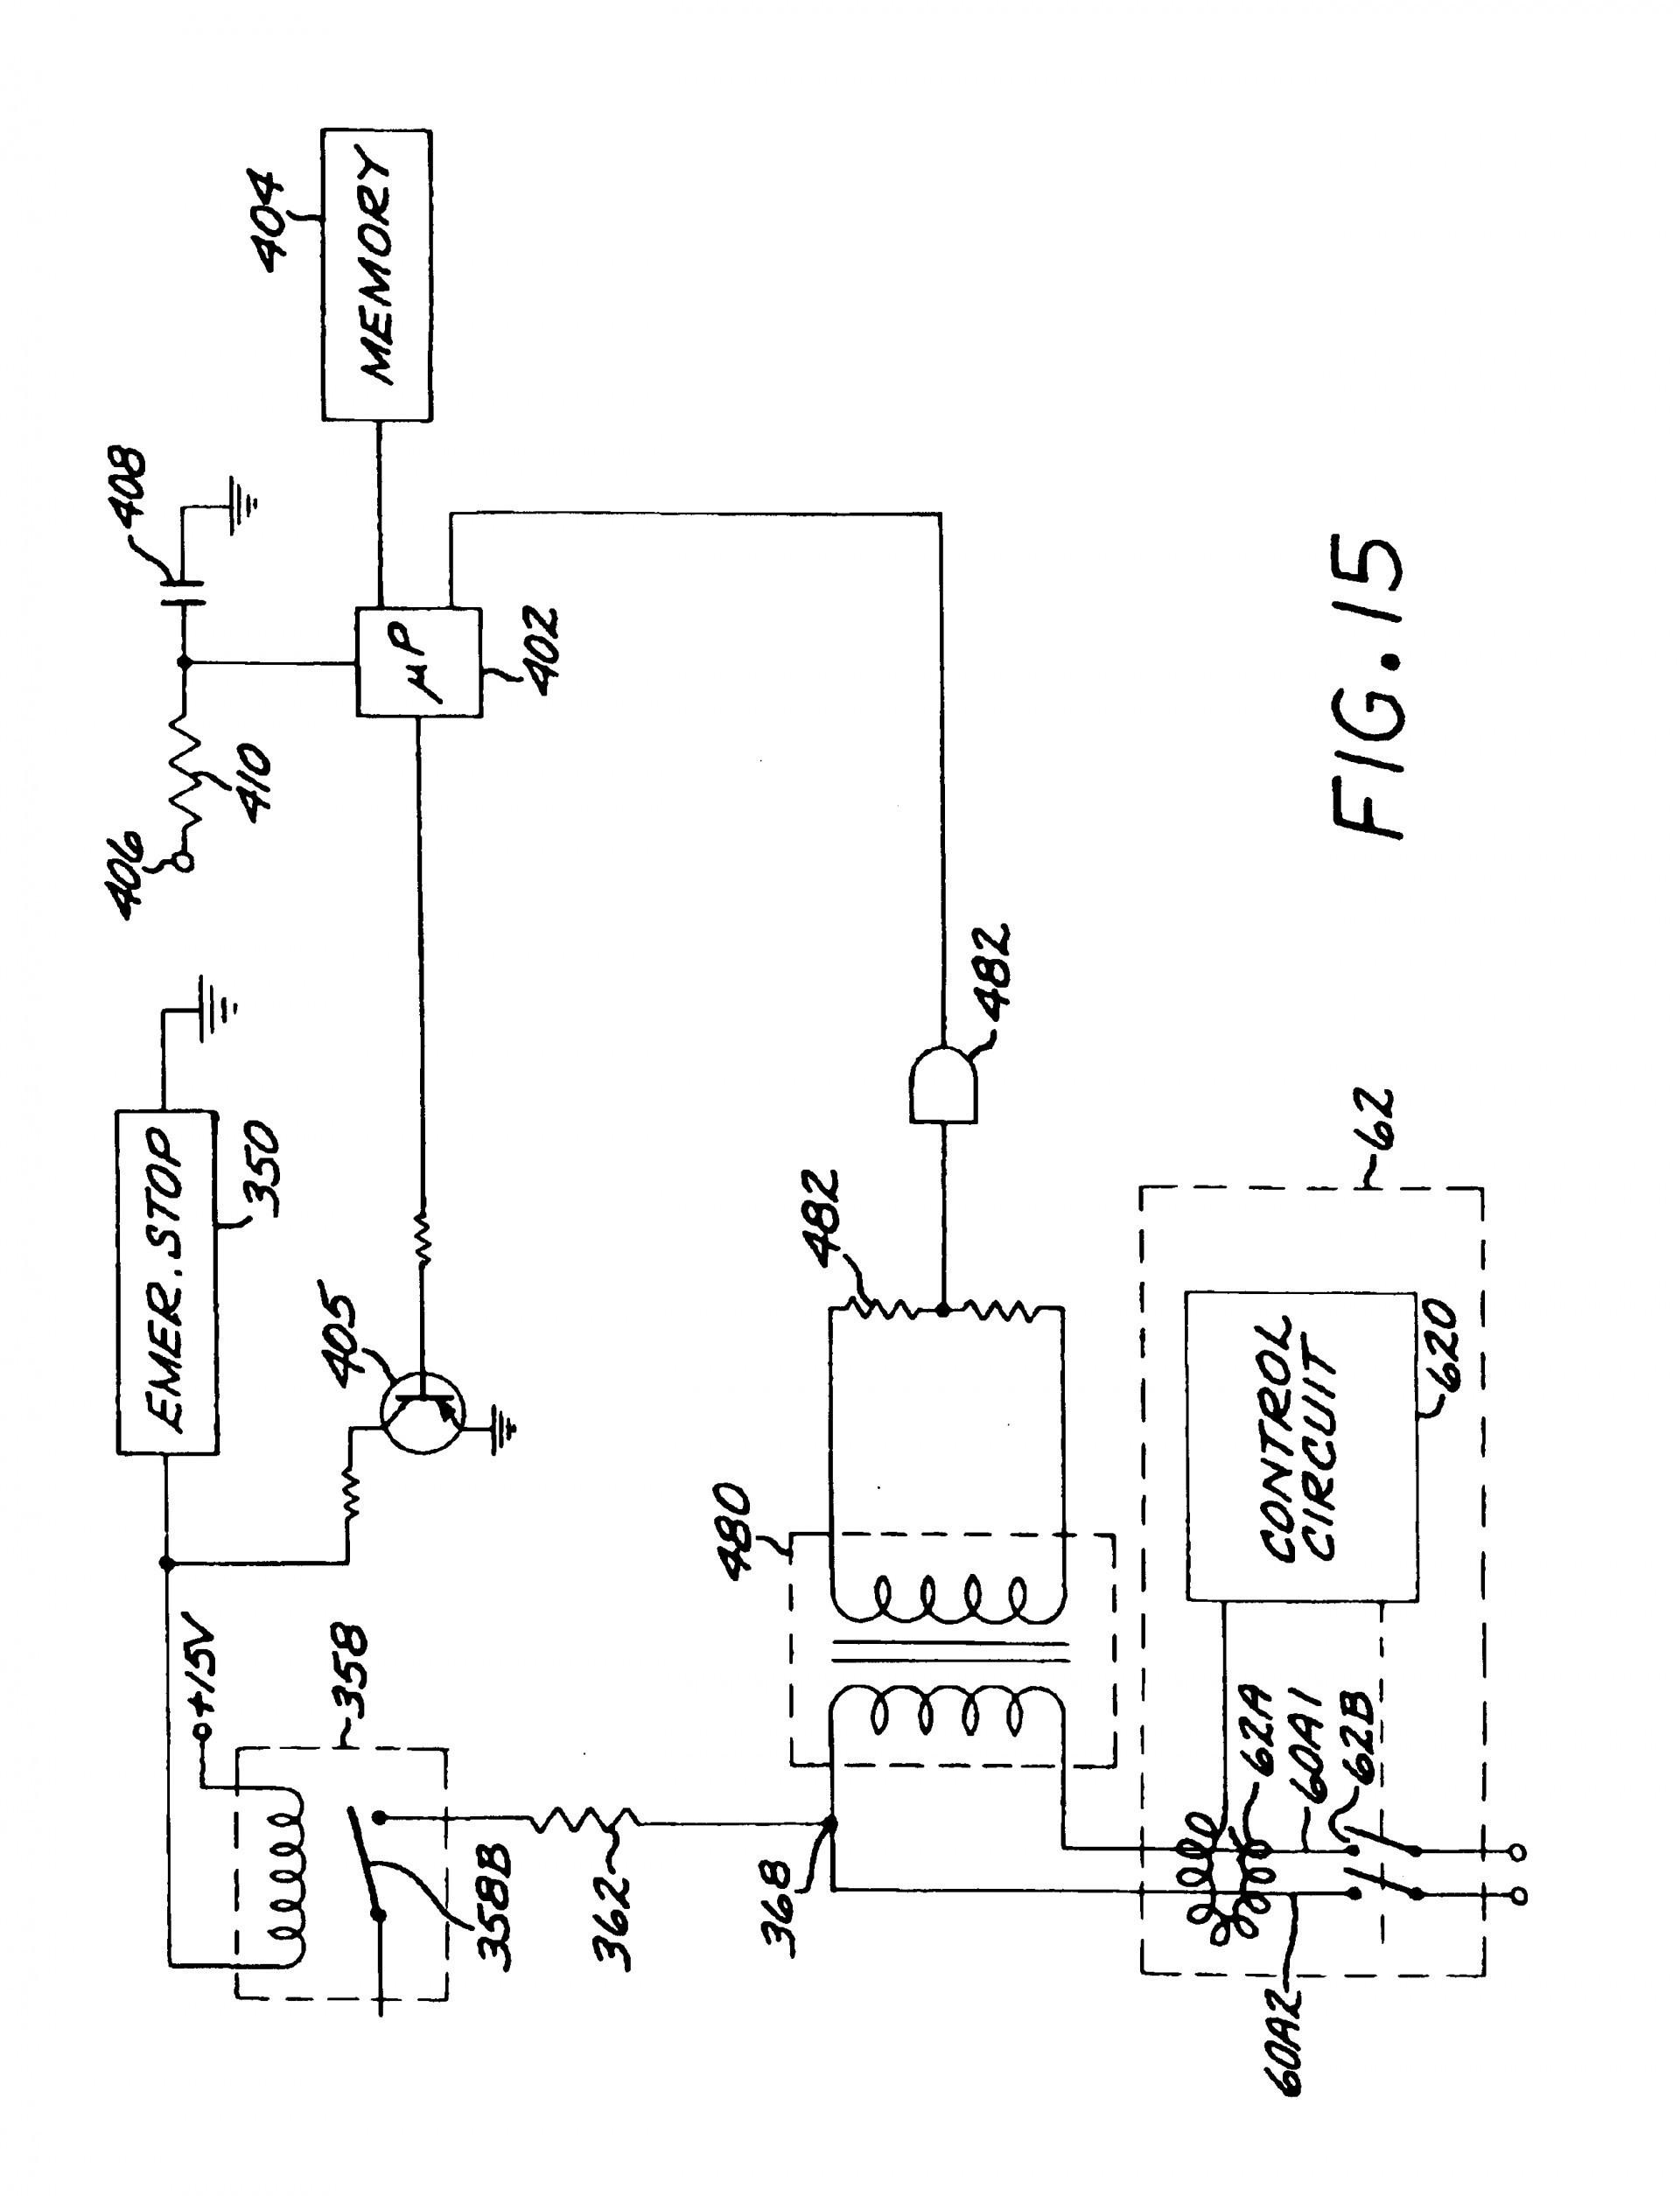 pentair pool pump wiring diagram on hayward super pump schematic rh 144 202 61 13